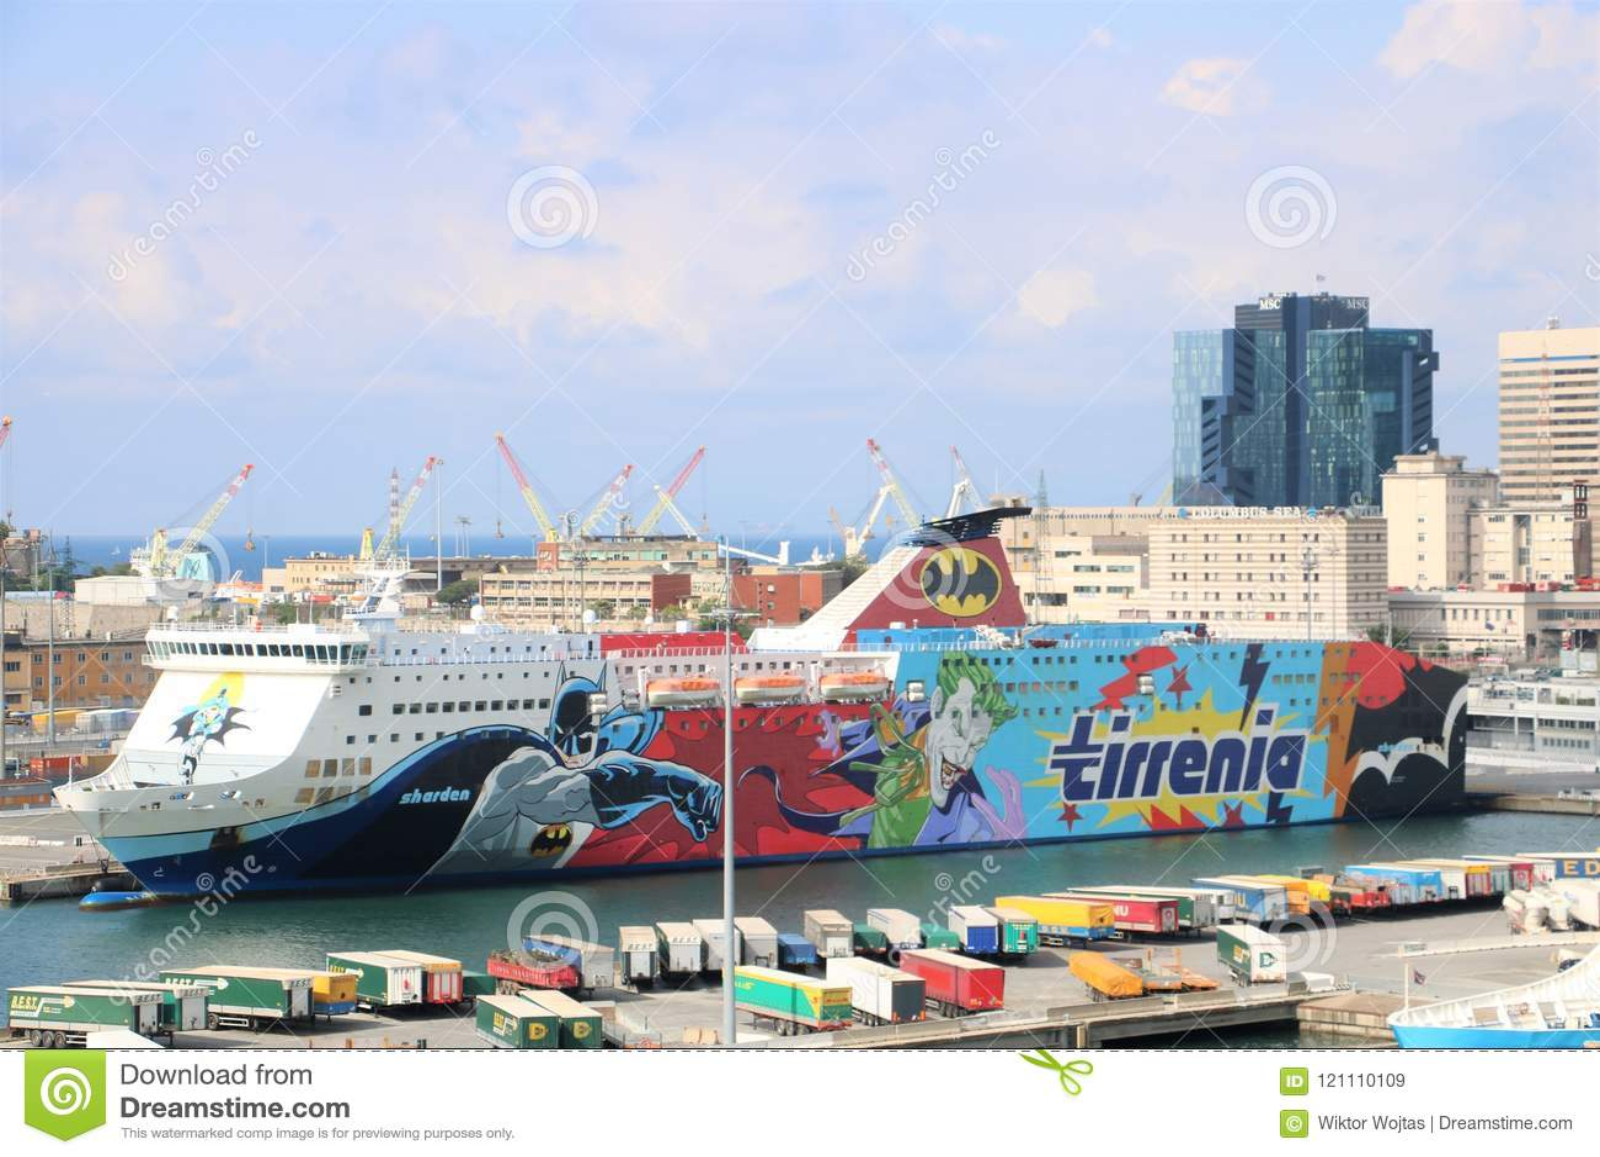 Cruise Ship Tirrenia Sharden Editorial Stock Image Image Of